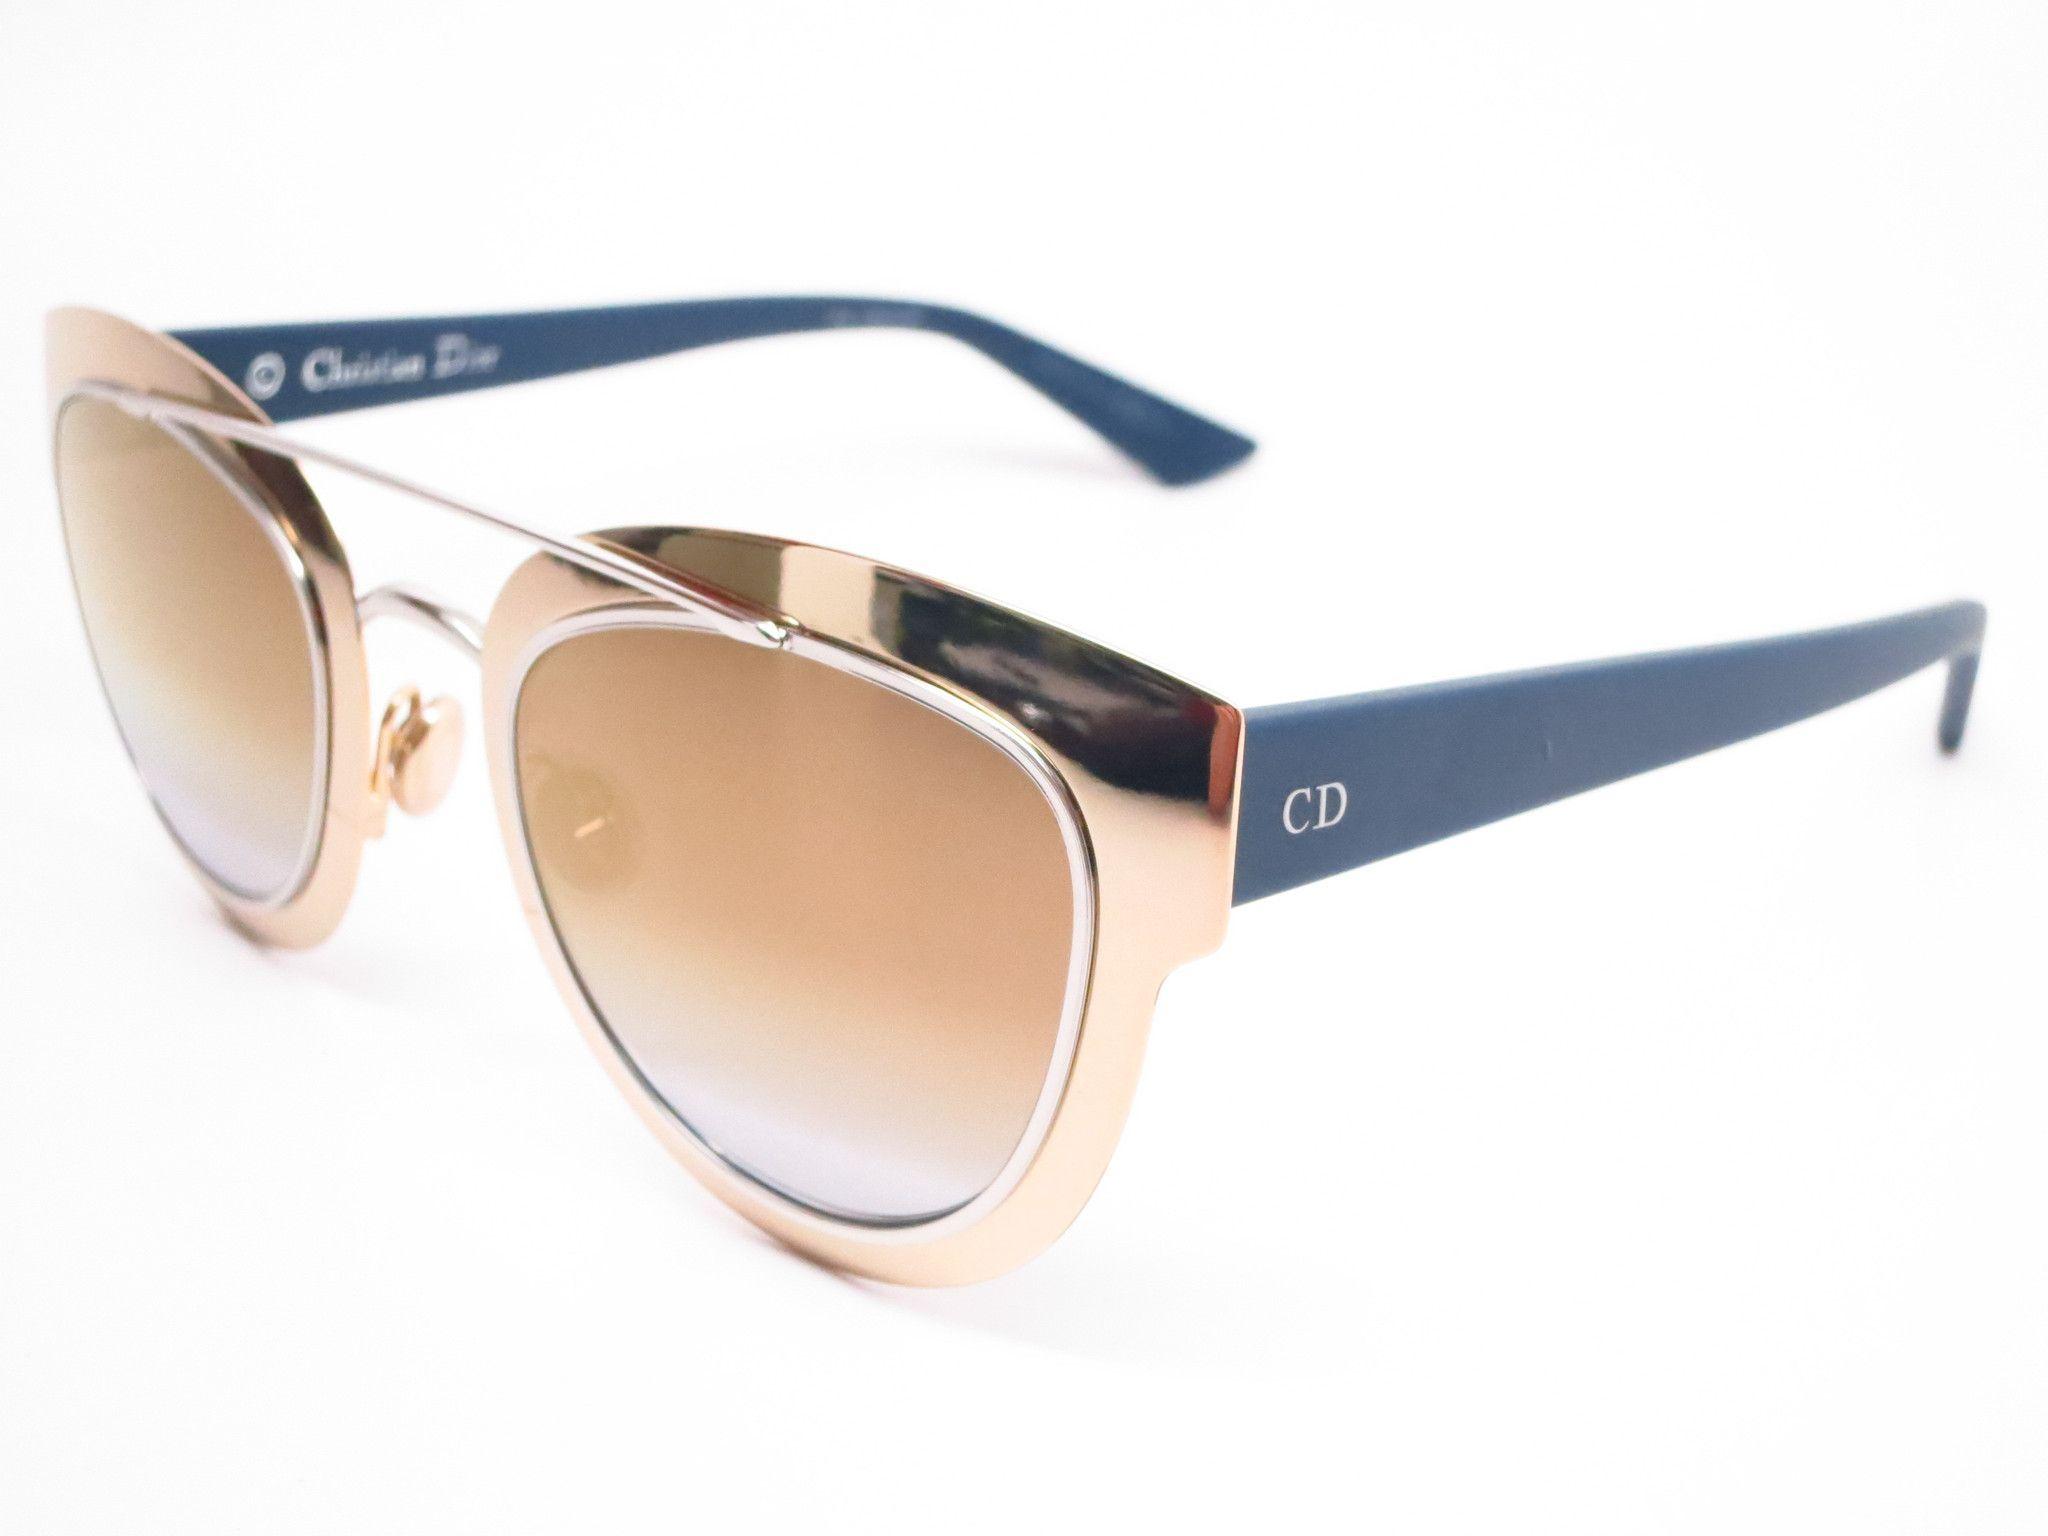 87692f56c07c8 Dior Chromic Sunglasses Product Details Brand   Christion Dior Model Name    Chromic Color Code   LML9F Gender   Womens Frame Color   Golf Palladium  Blue ...